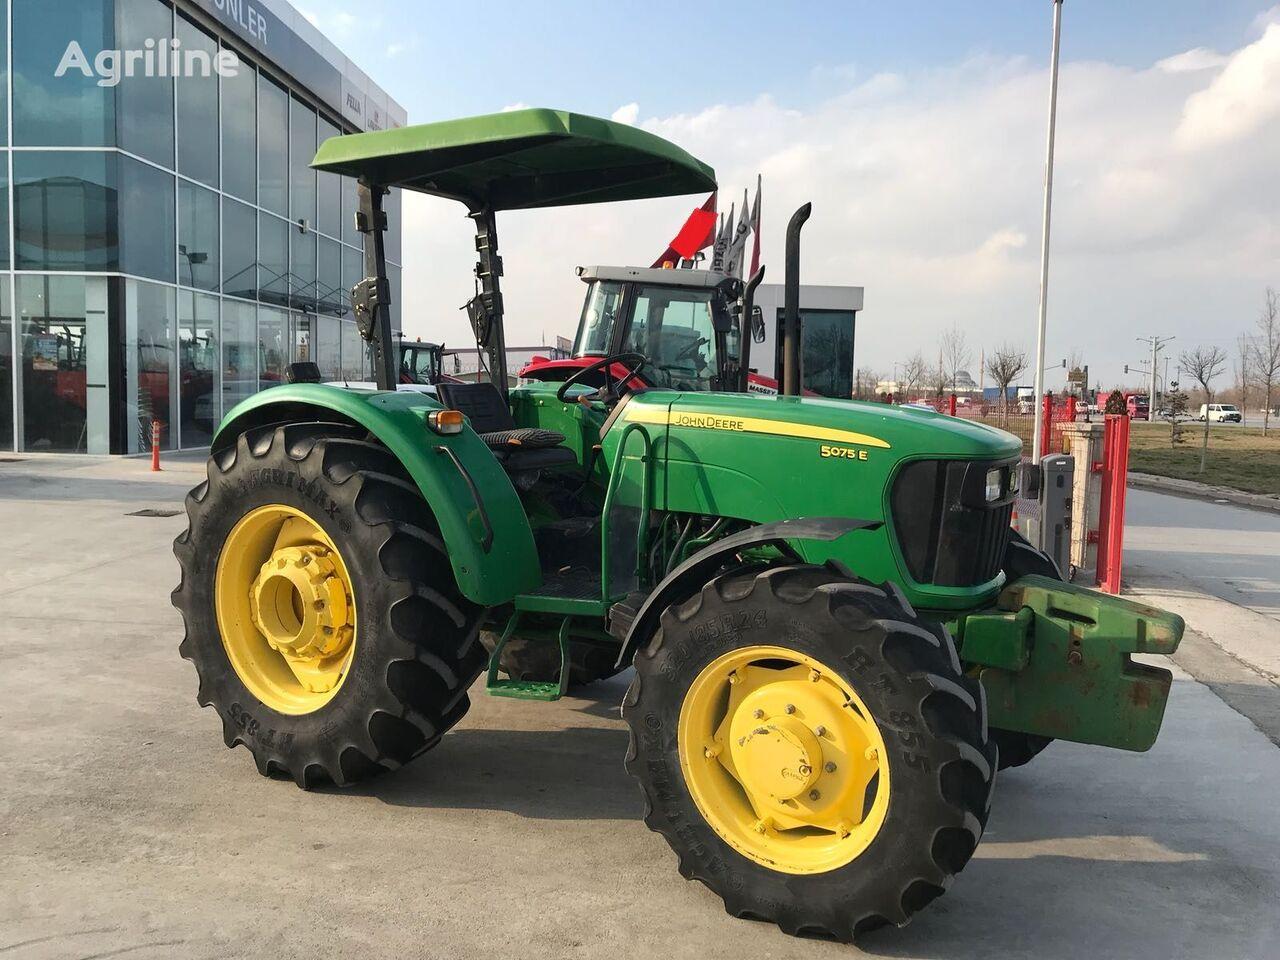 traktor na kolesih JOHN DEERE 5075 E